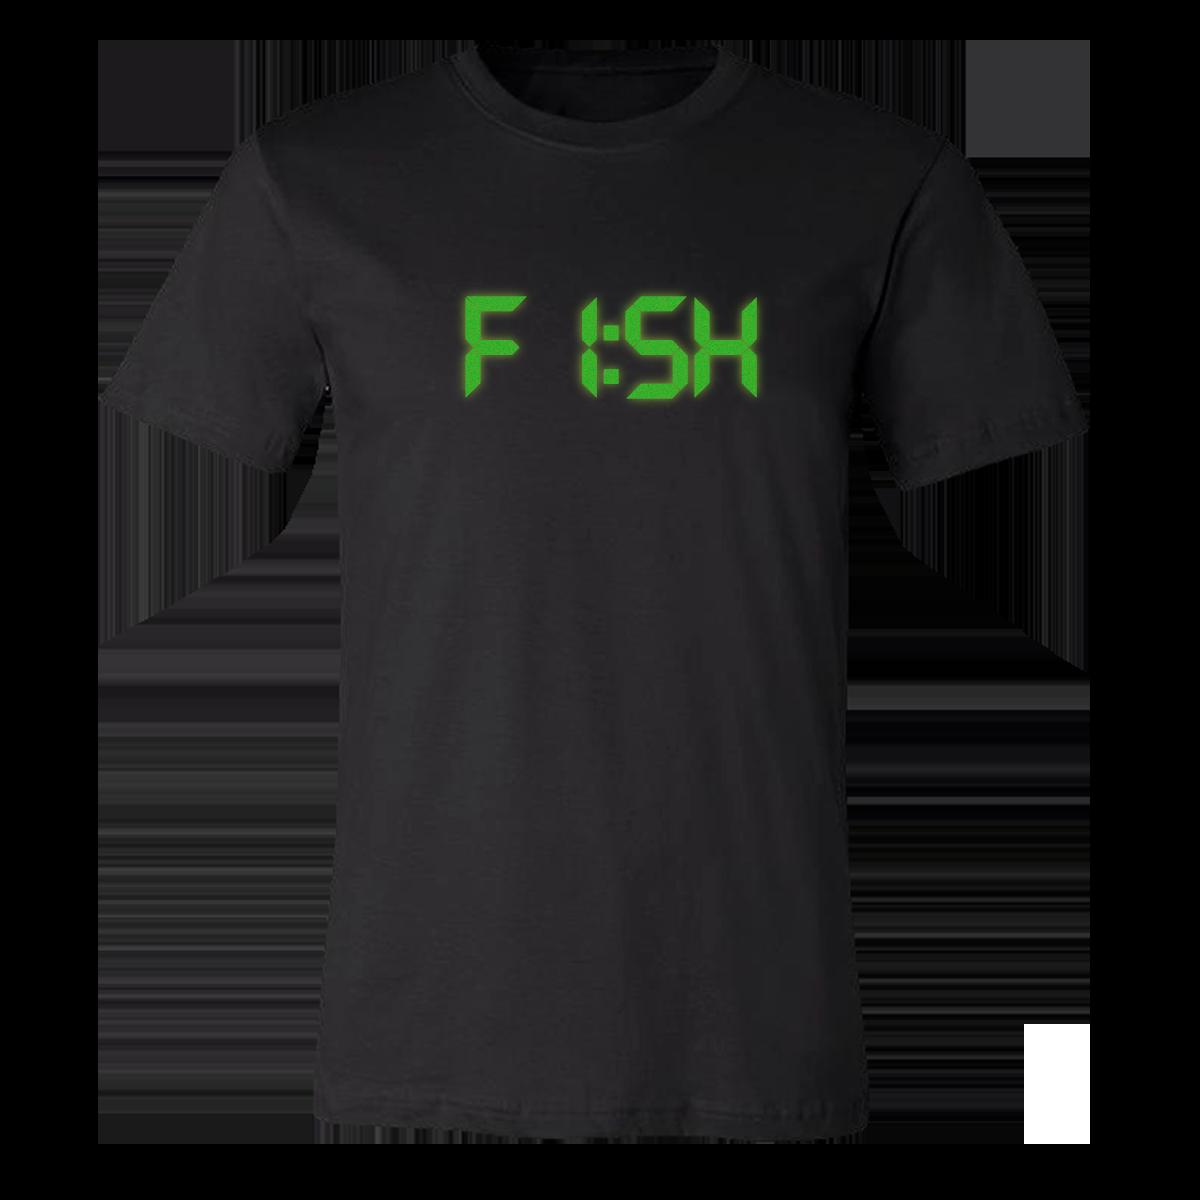 Fish Clock - Vintage Soft Unisex T Shirt